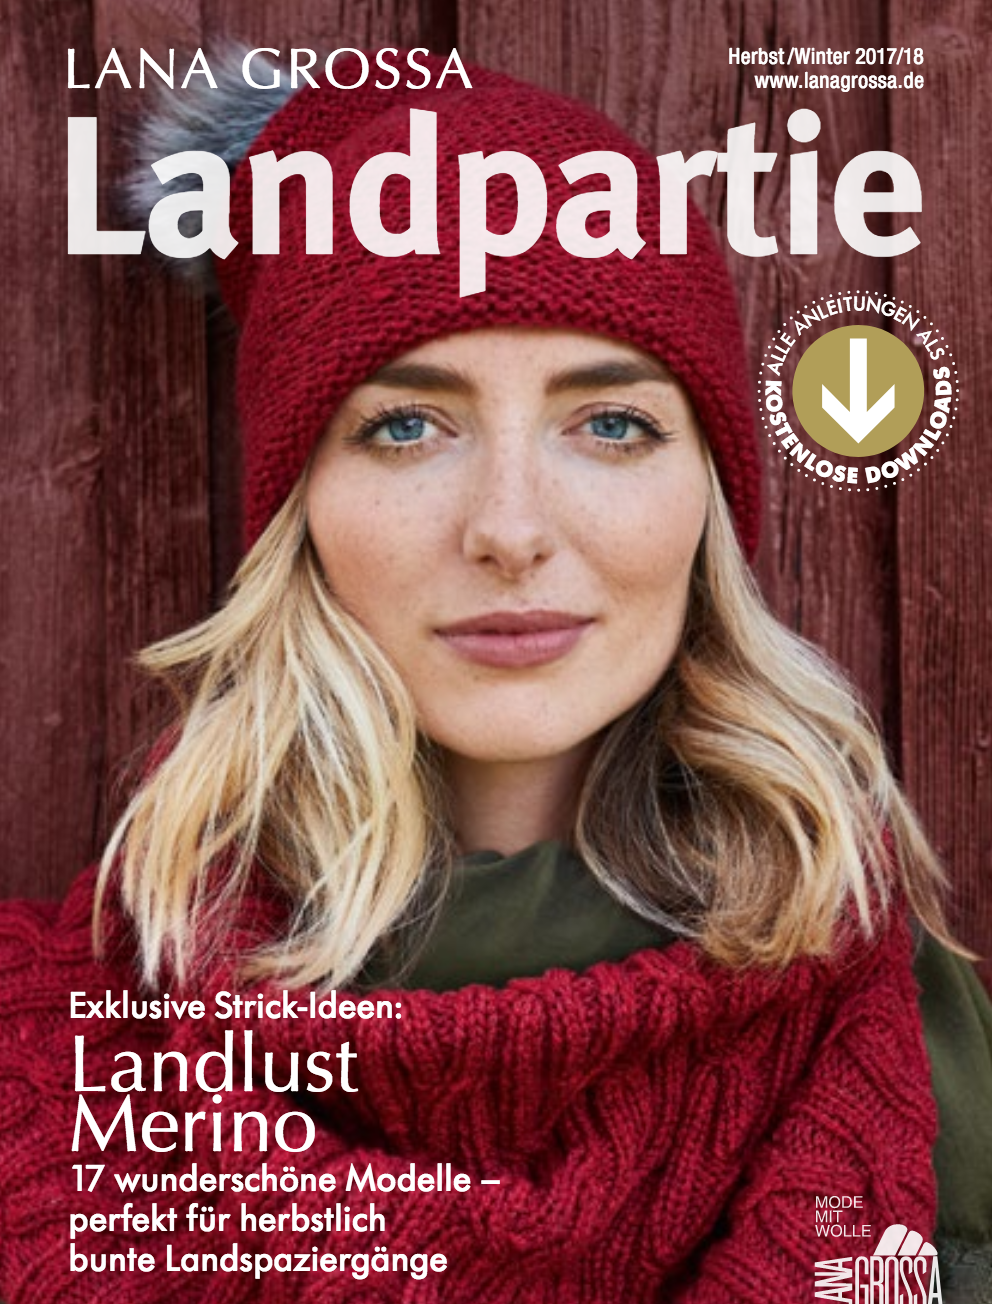 Landlust Lana Grossa Betina Pohl